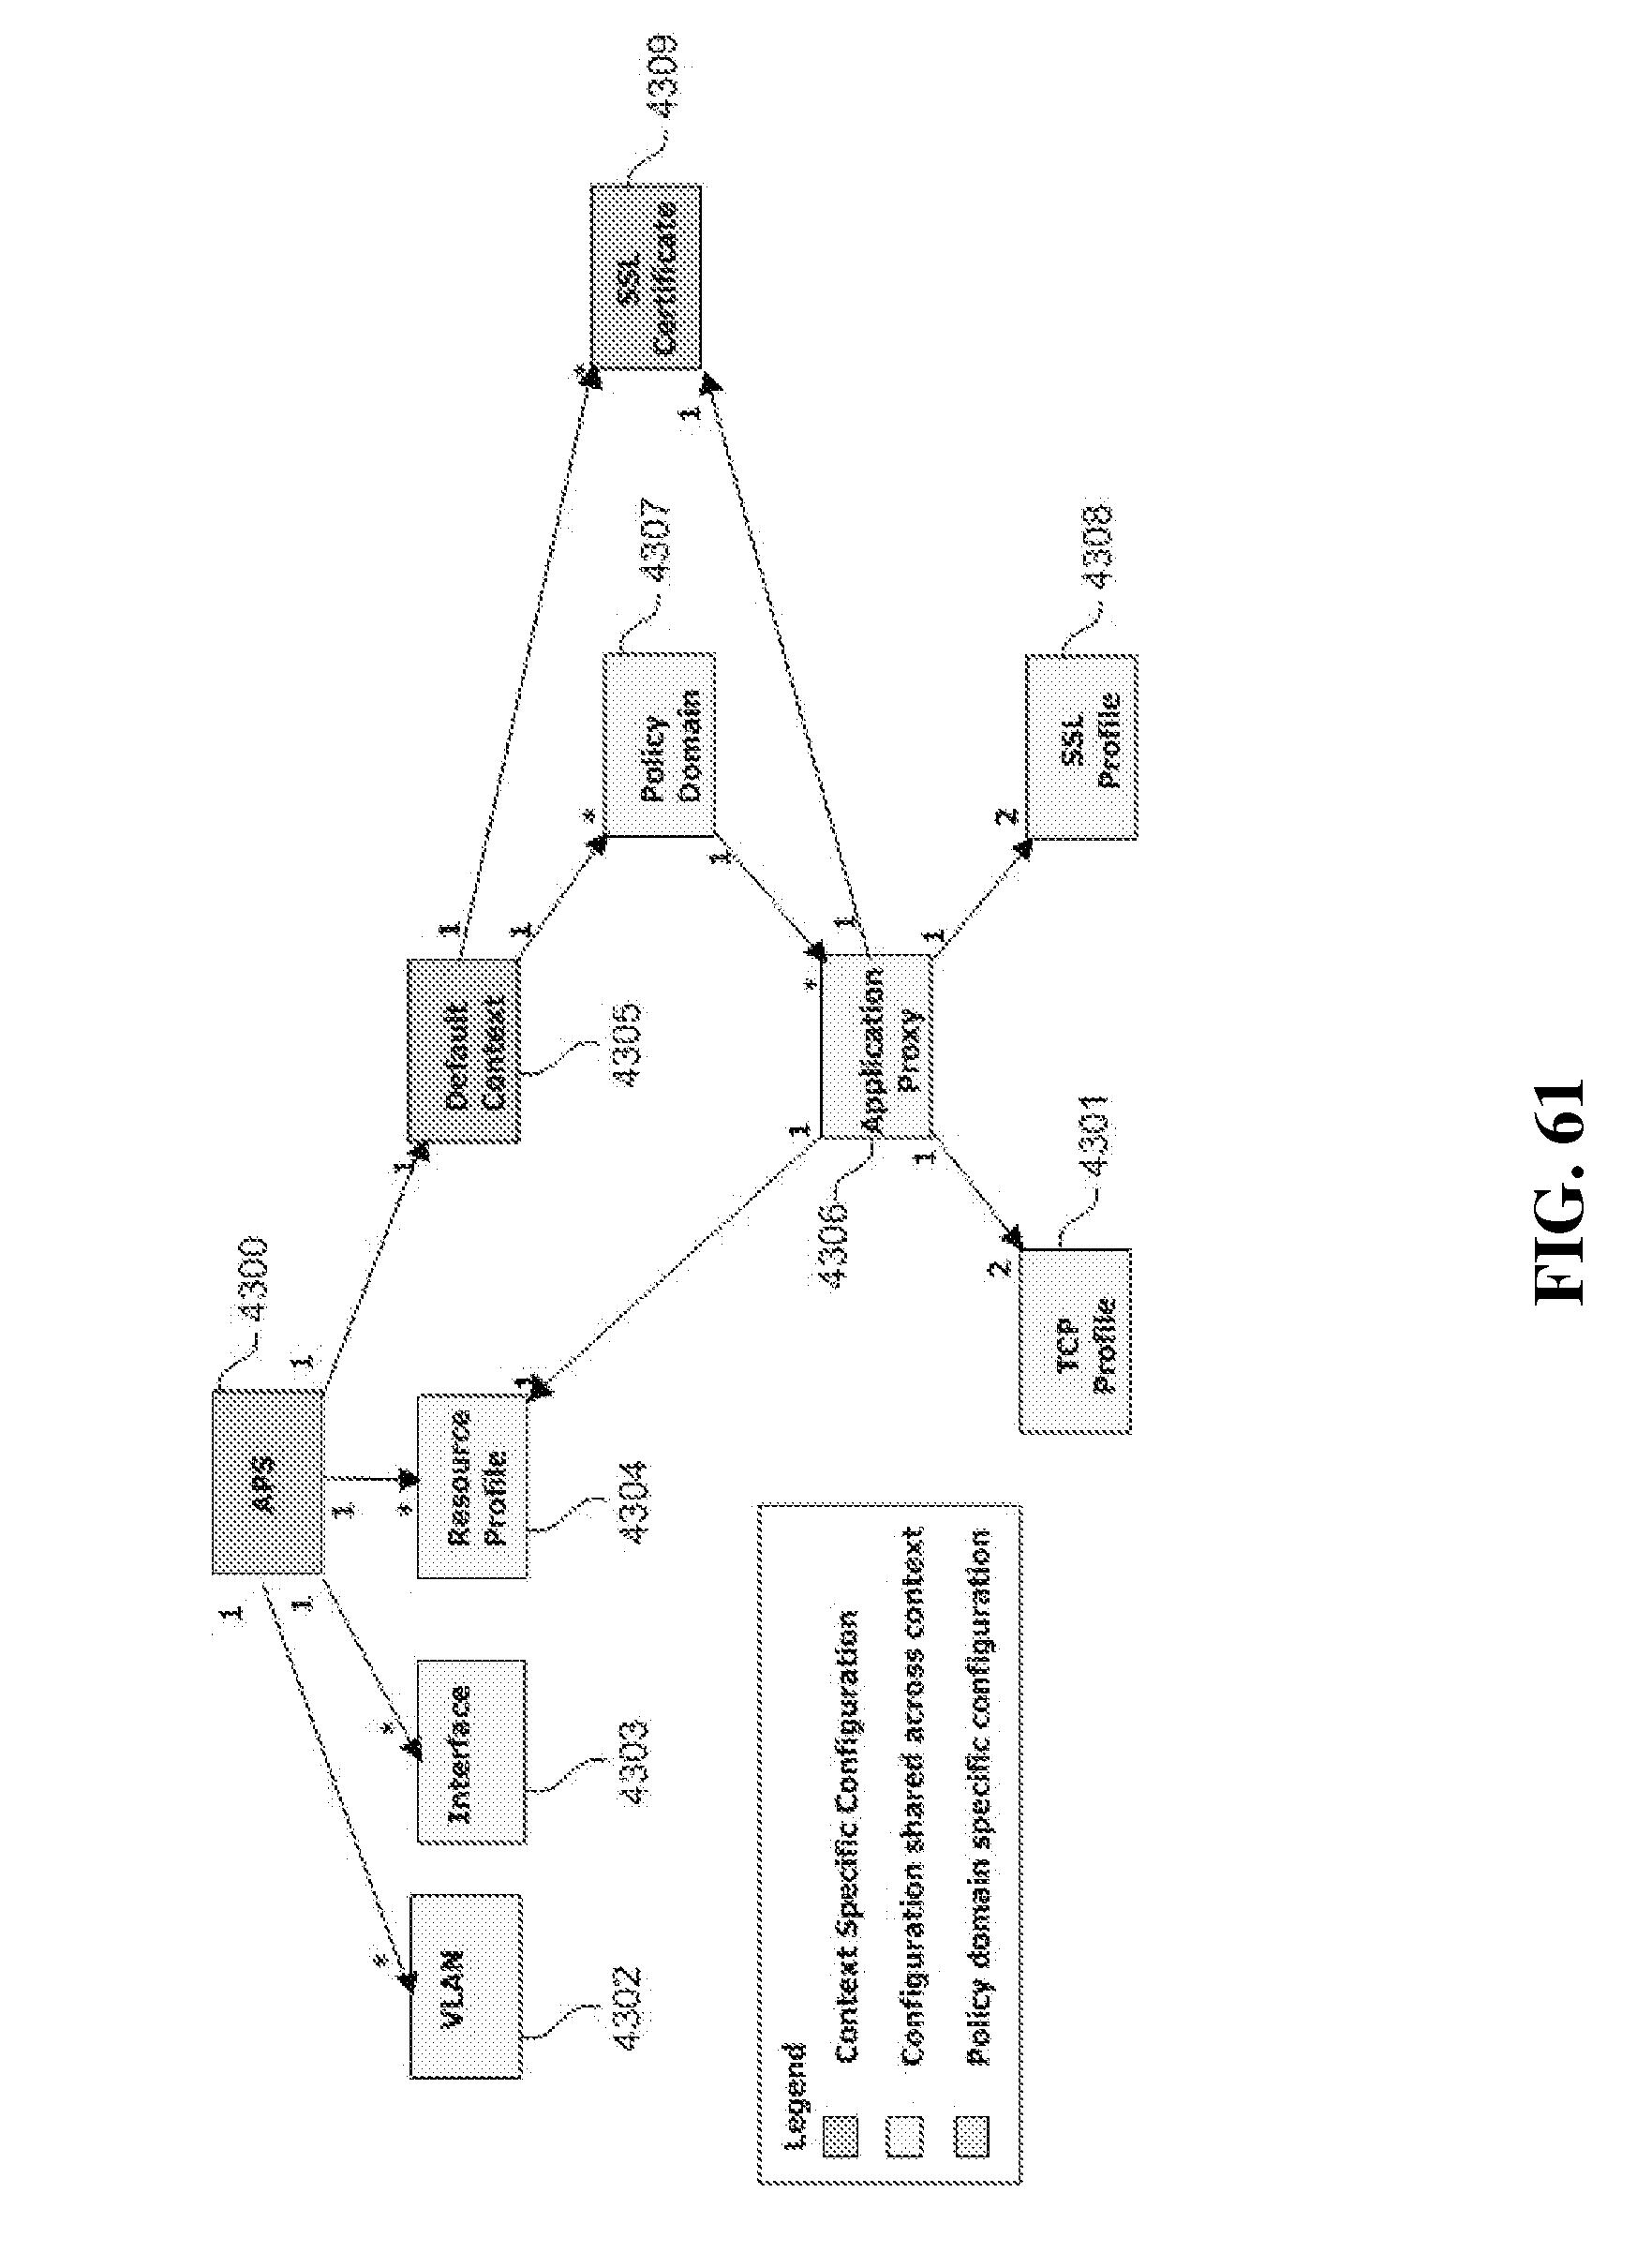 Patent US 7,921,686 B2